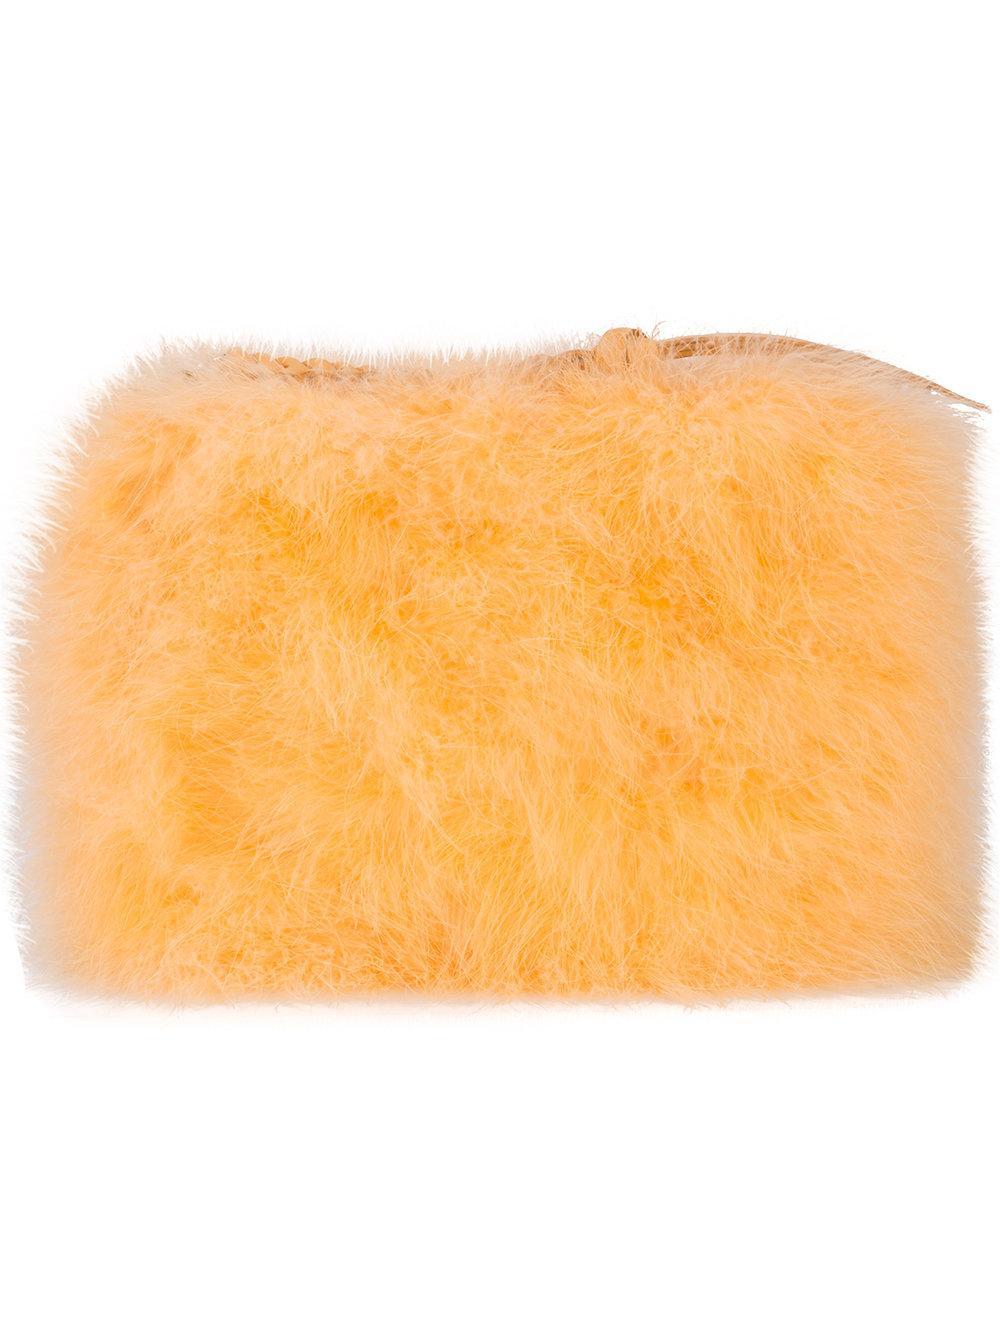 Nina Ricci Marabou Feather Clutch Bag